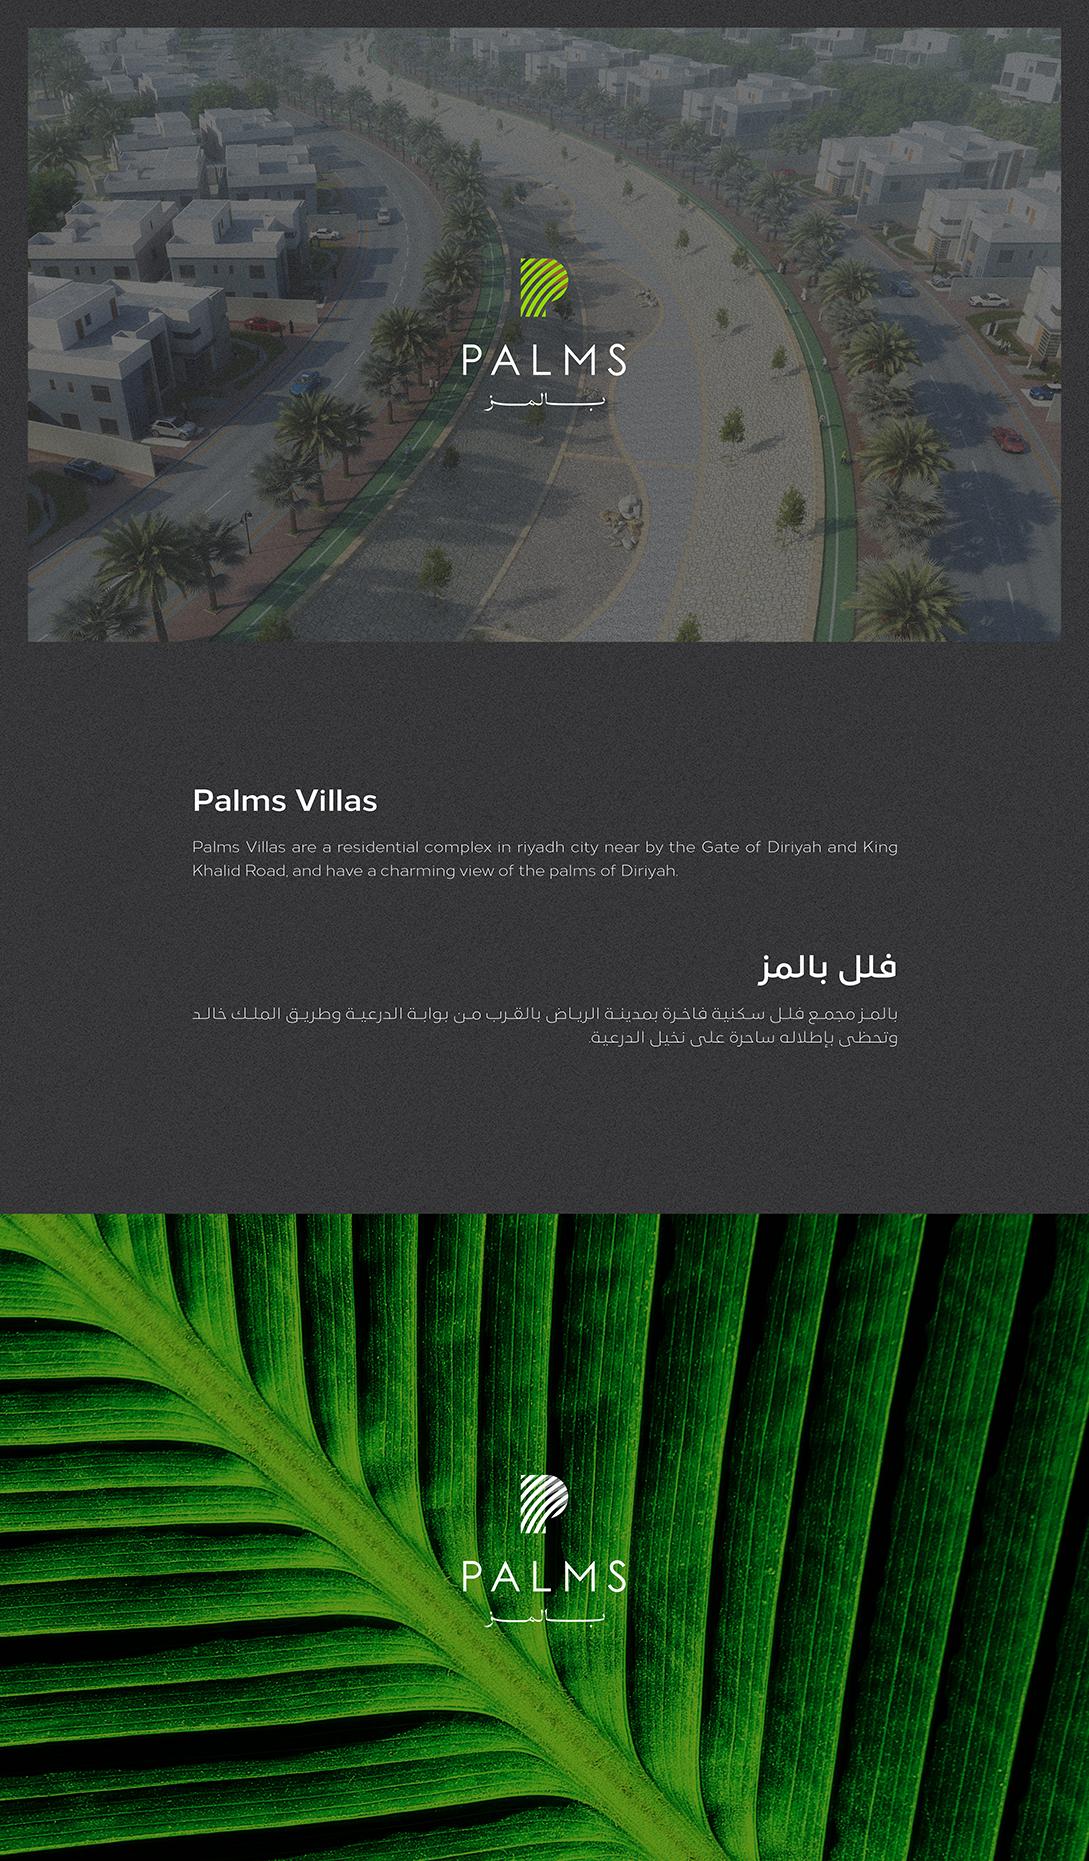 Palms Villas